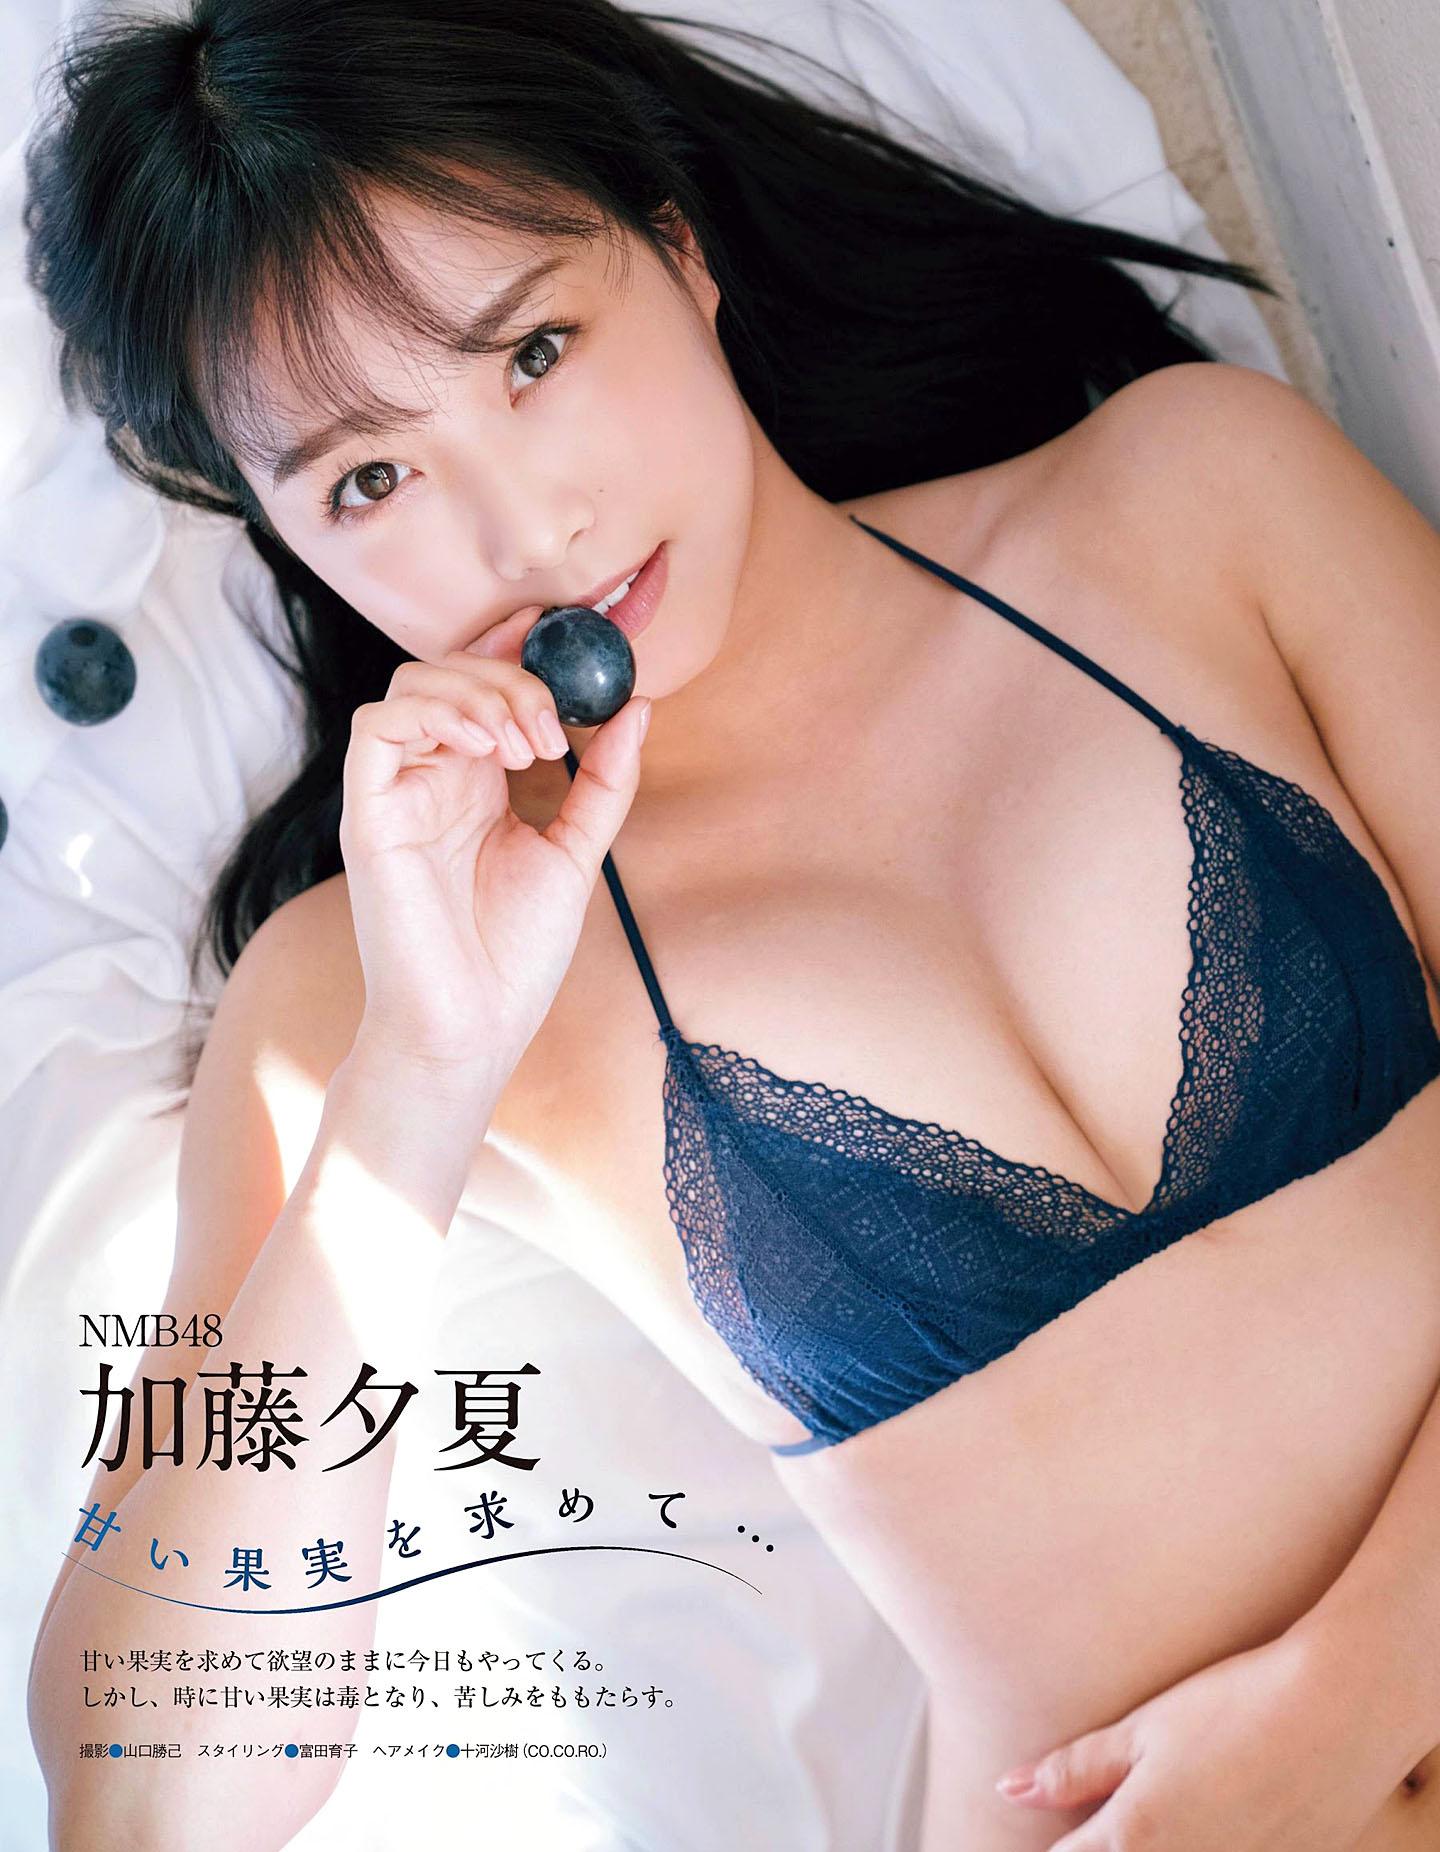 Kato Yuuka NMB48 EX-Taishu 2011 01.jpg